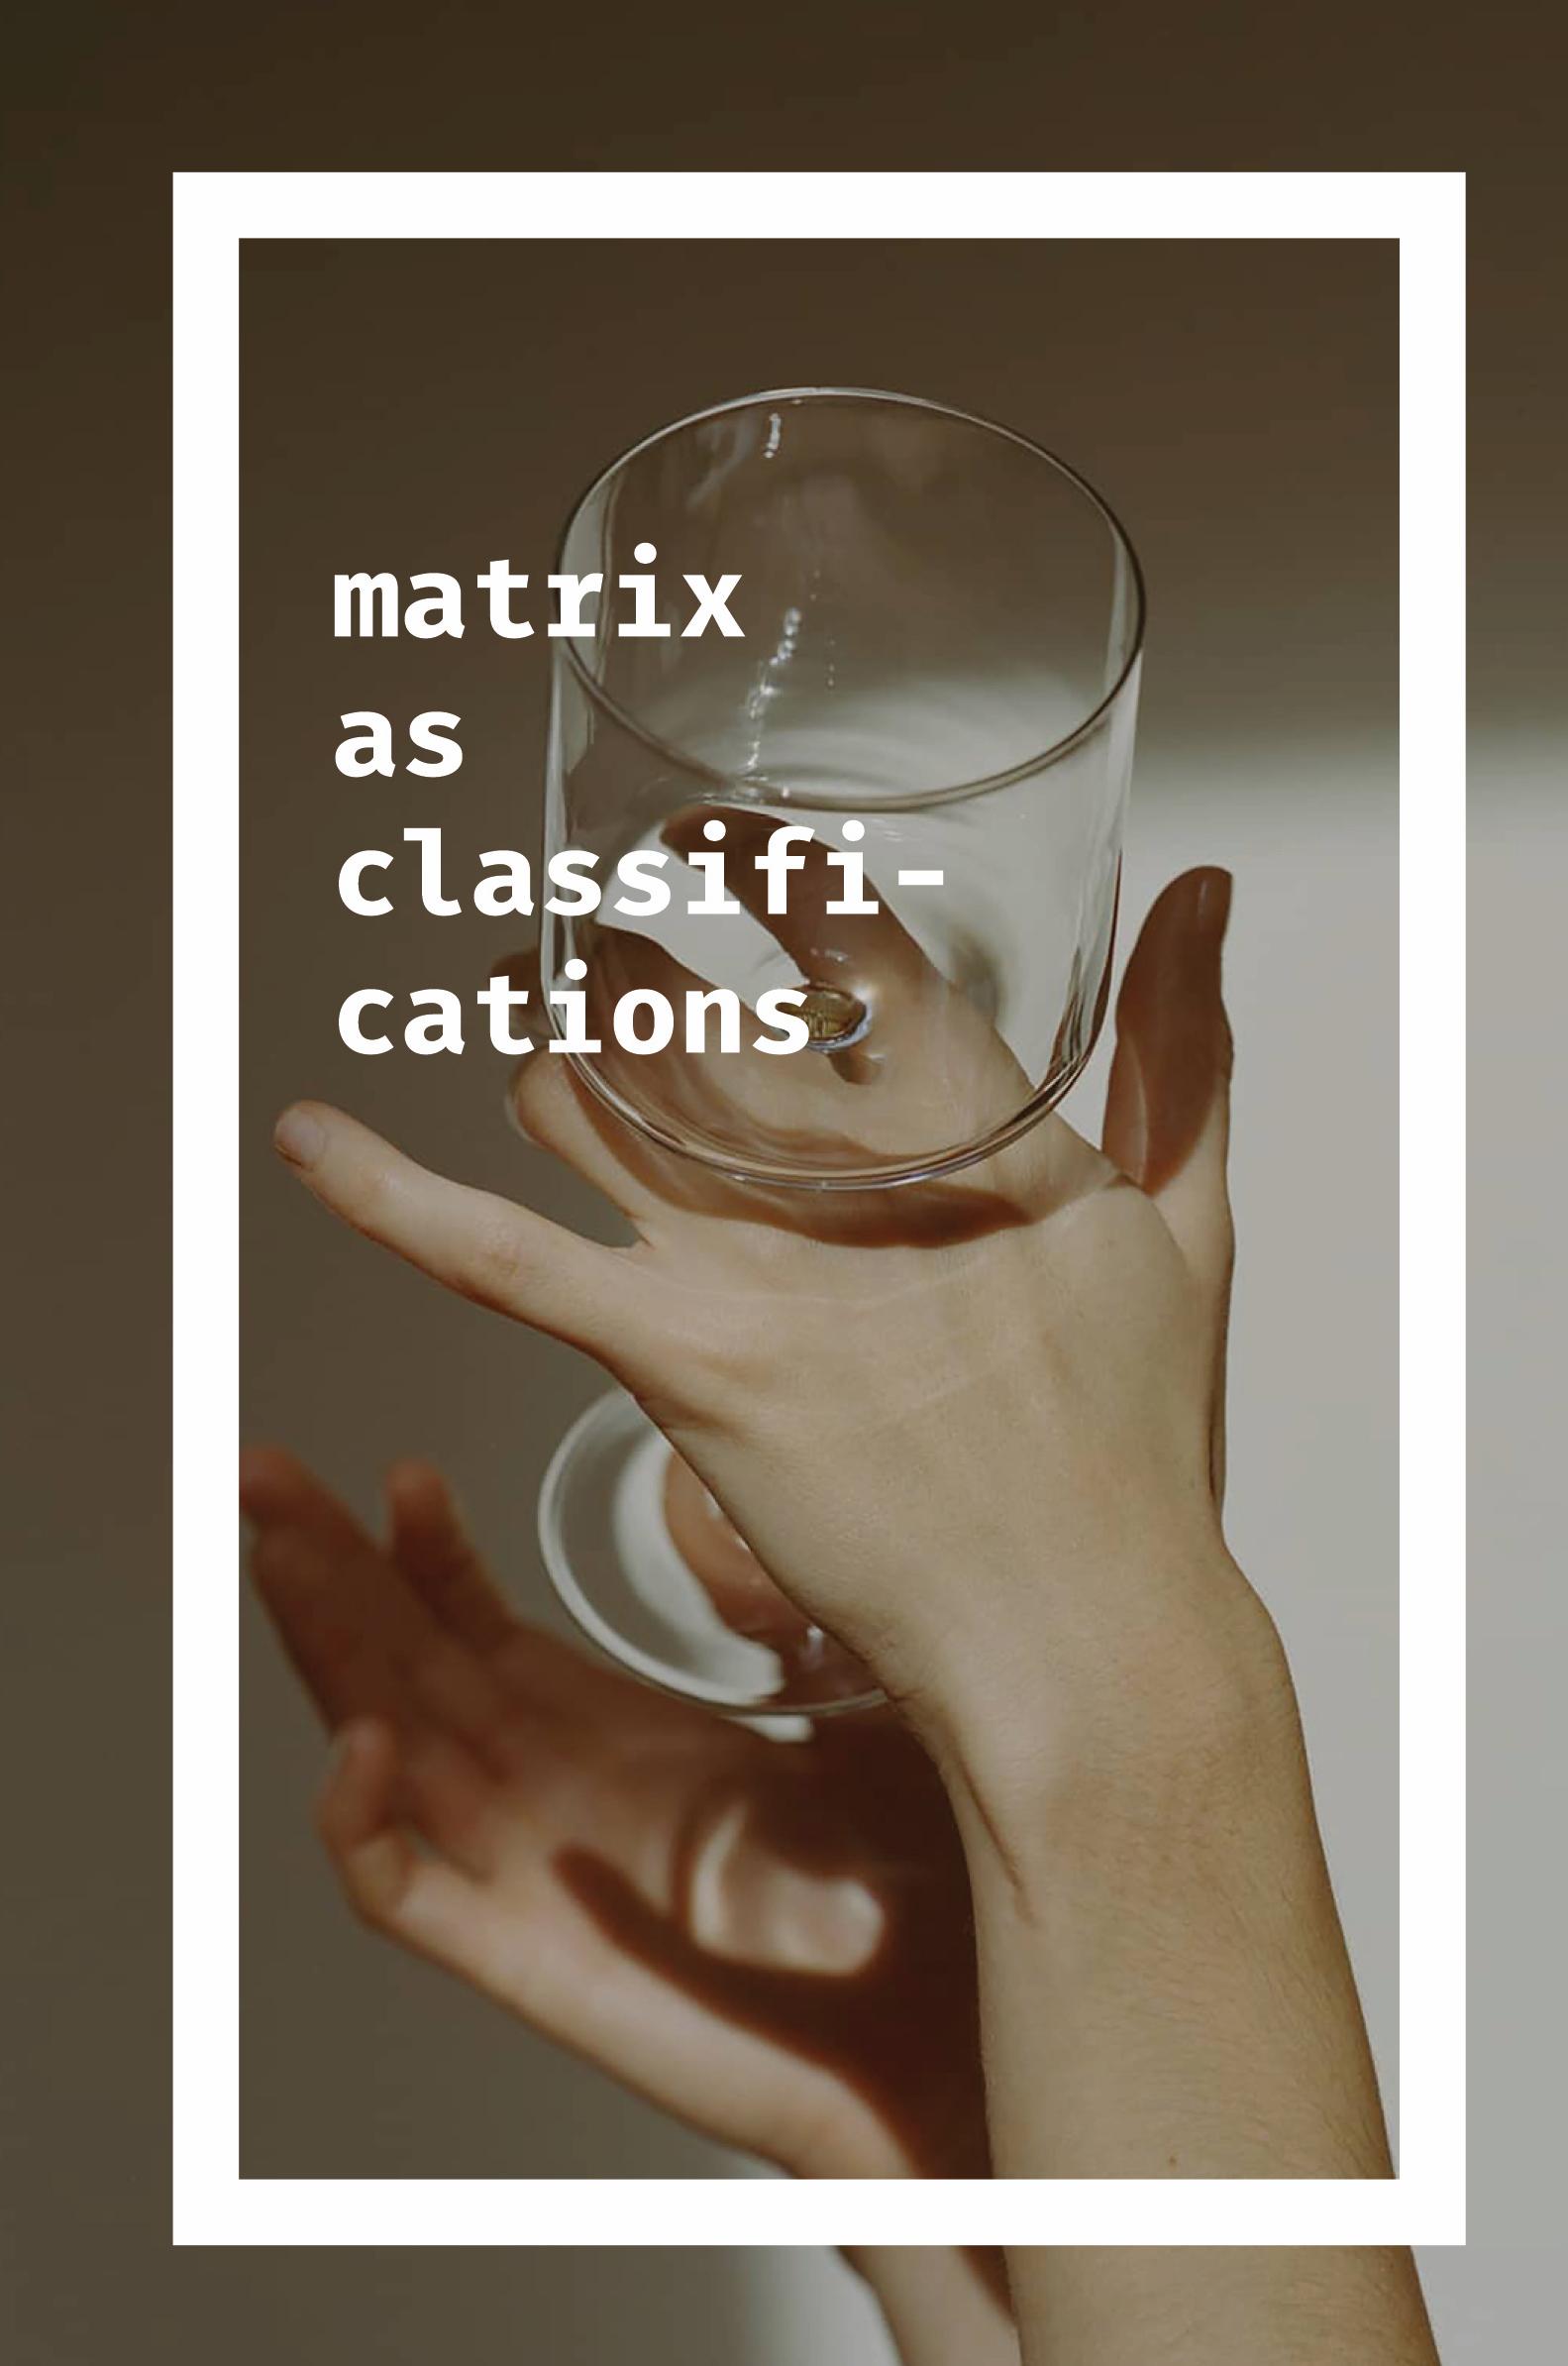 MATRIX AS CLASSIFICATION, 2016